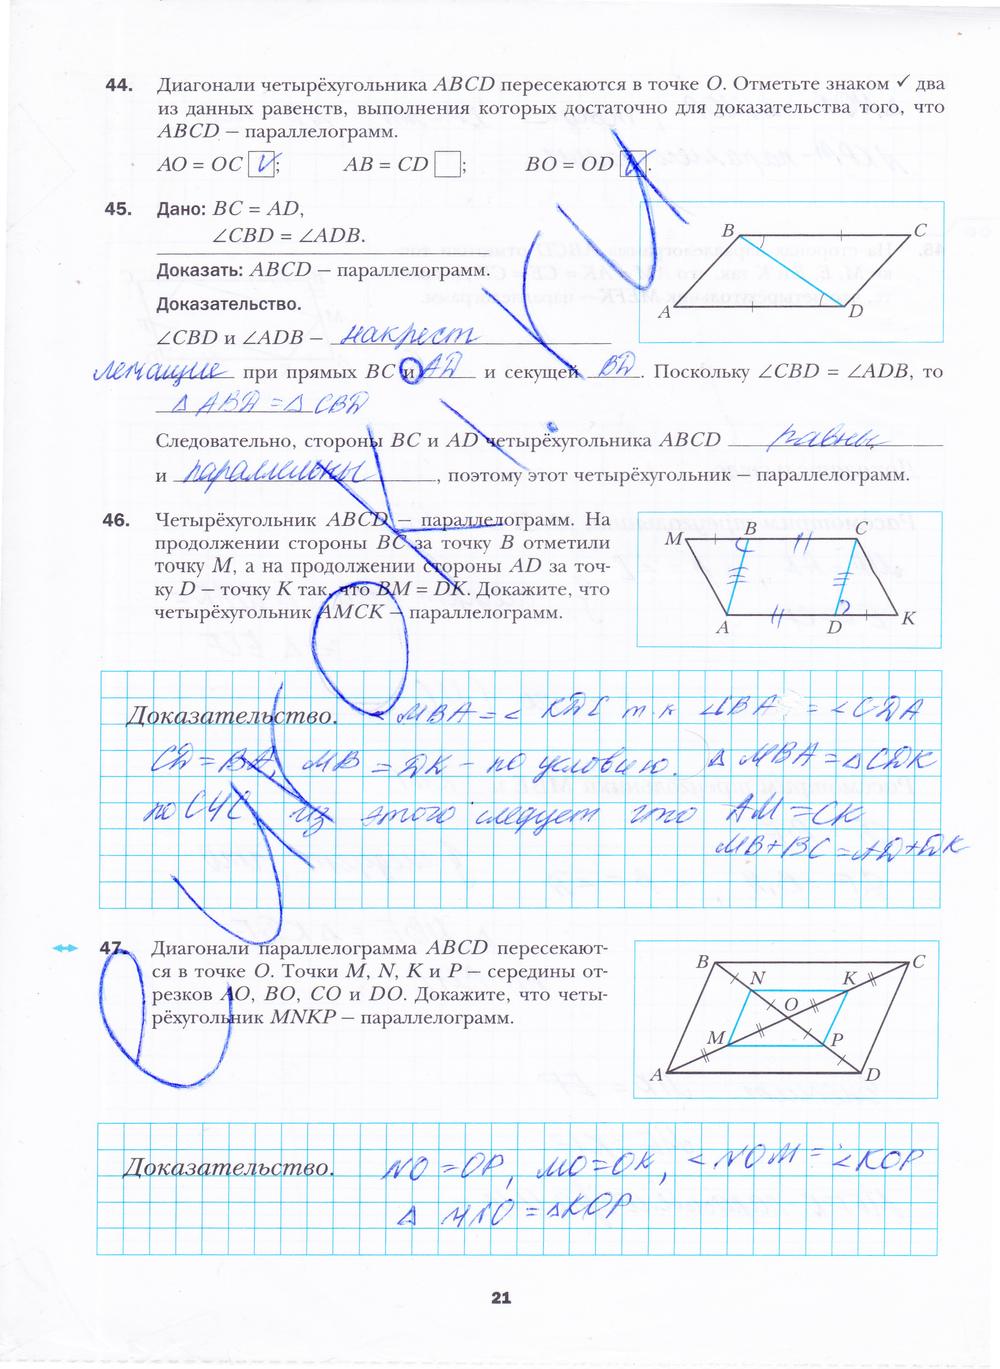 Решение задач по геометрии за 8 класс онлайн по углублённому изучению мерзляк